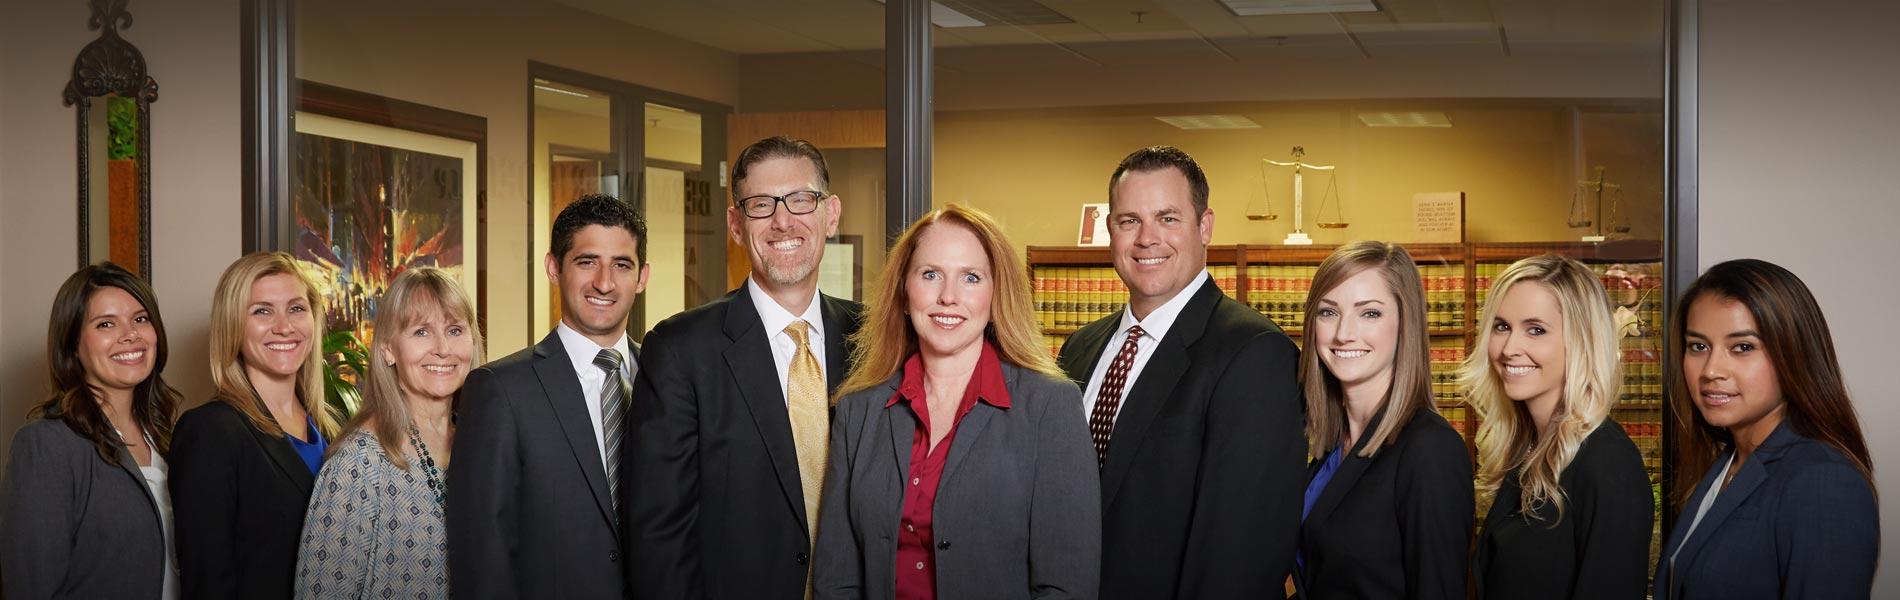 Berman & Riedel, LLP - Attorneys at Law